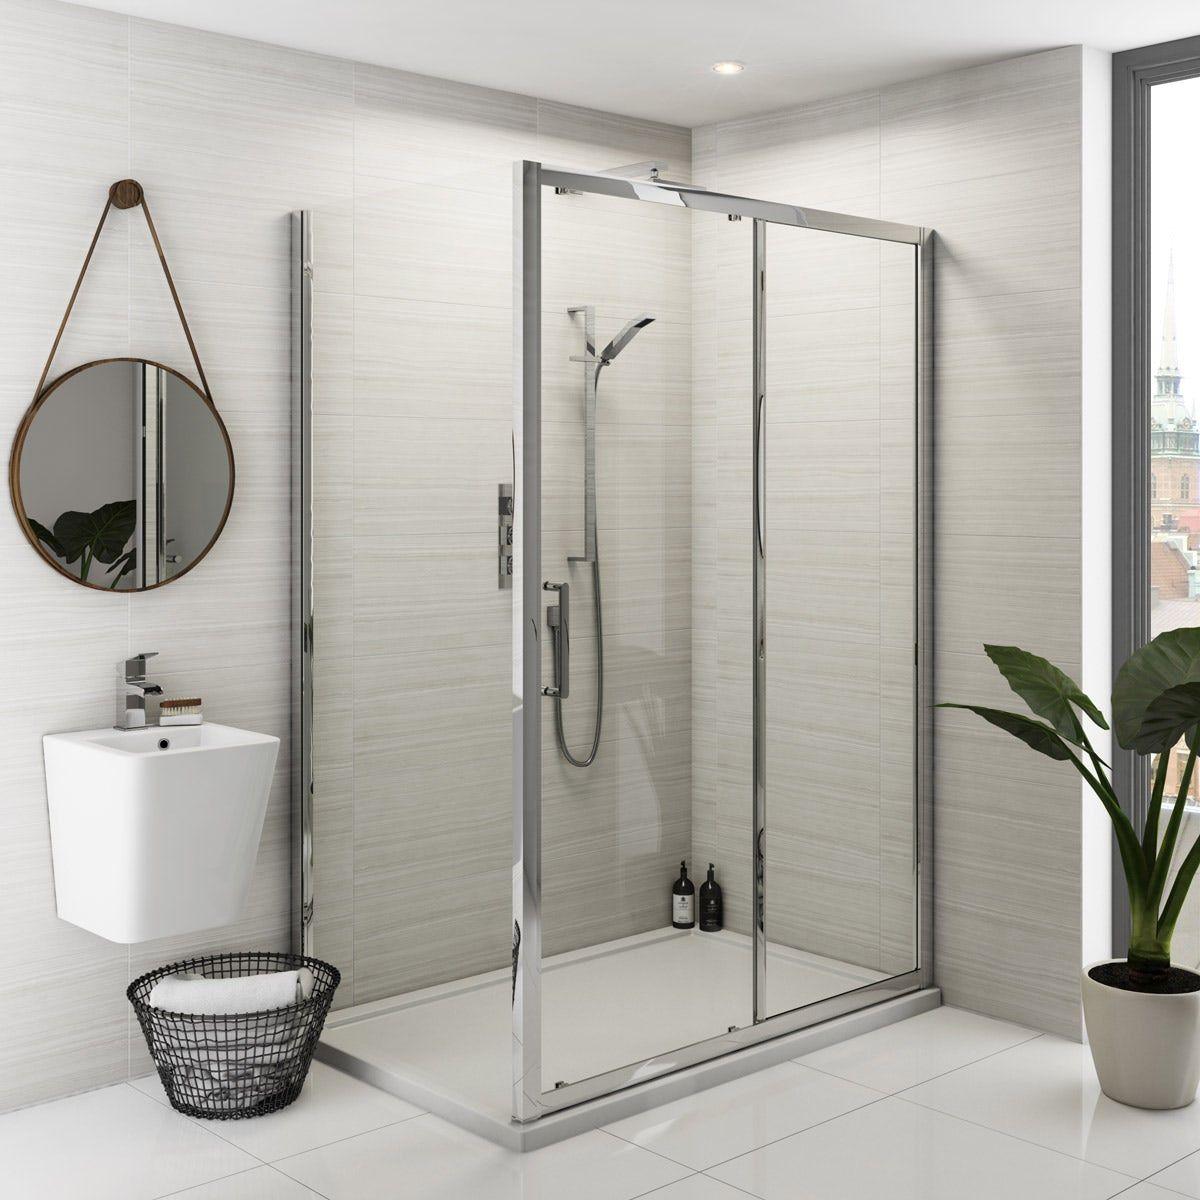 700 x 800 quadrant shower enclosure best gas hedge trimmer